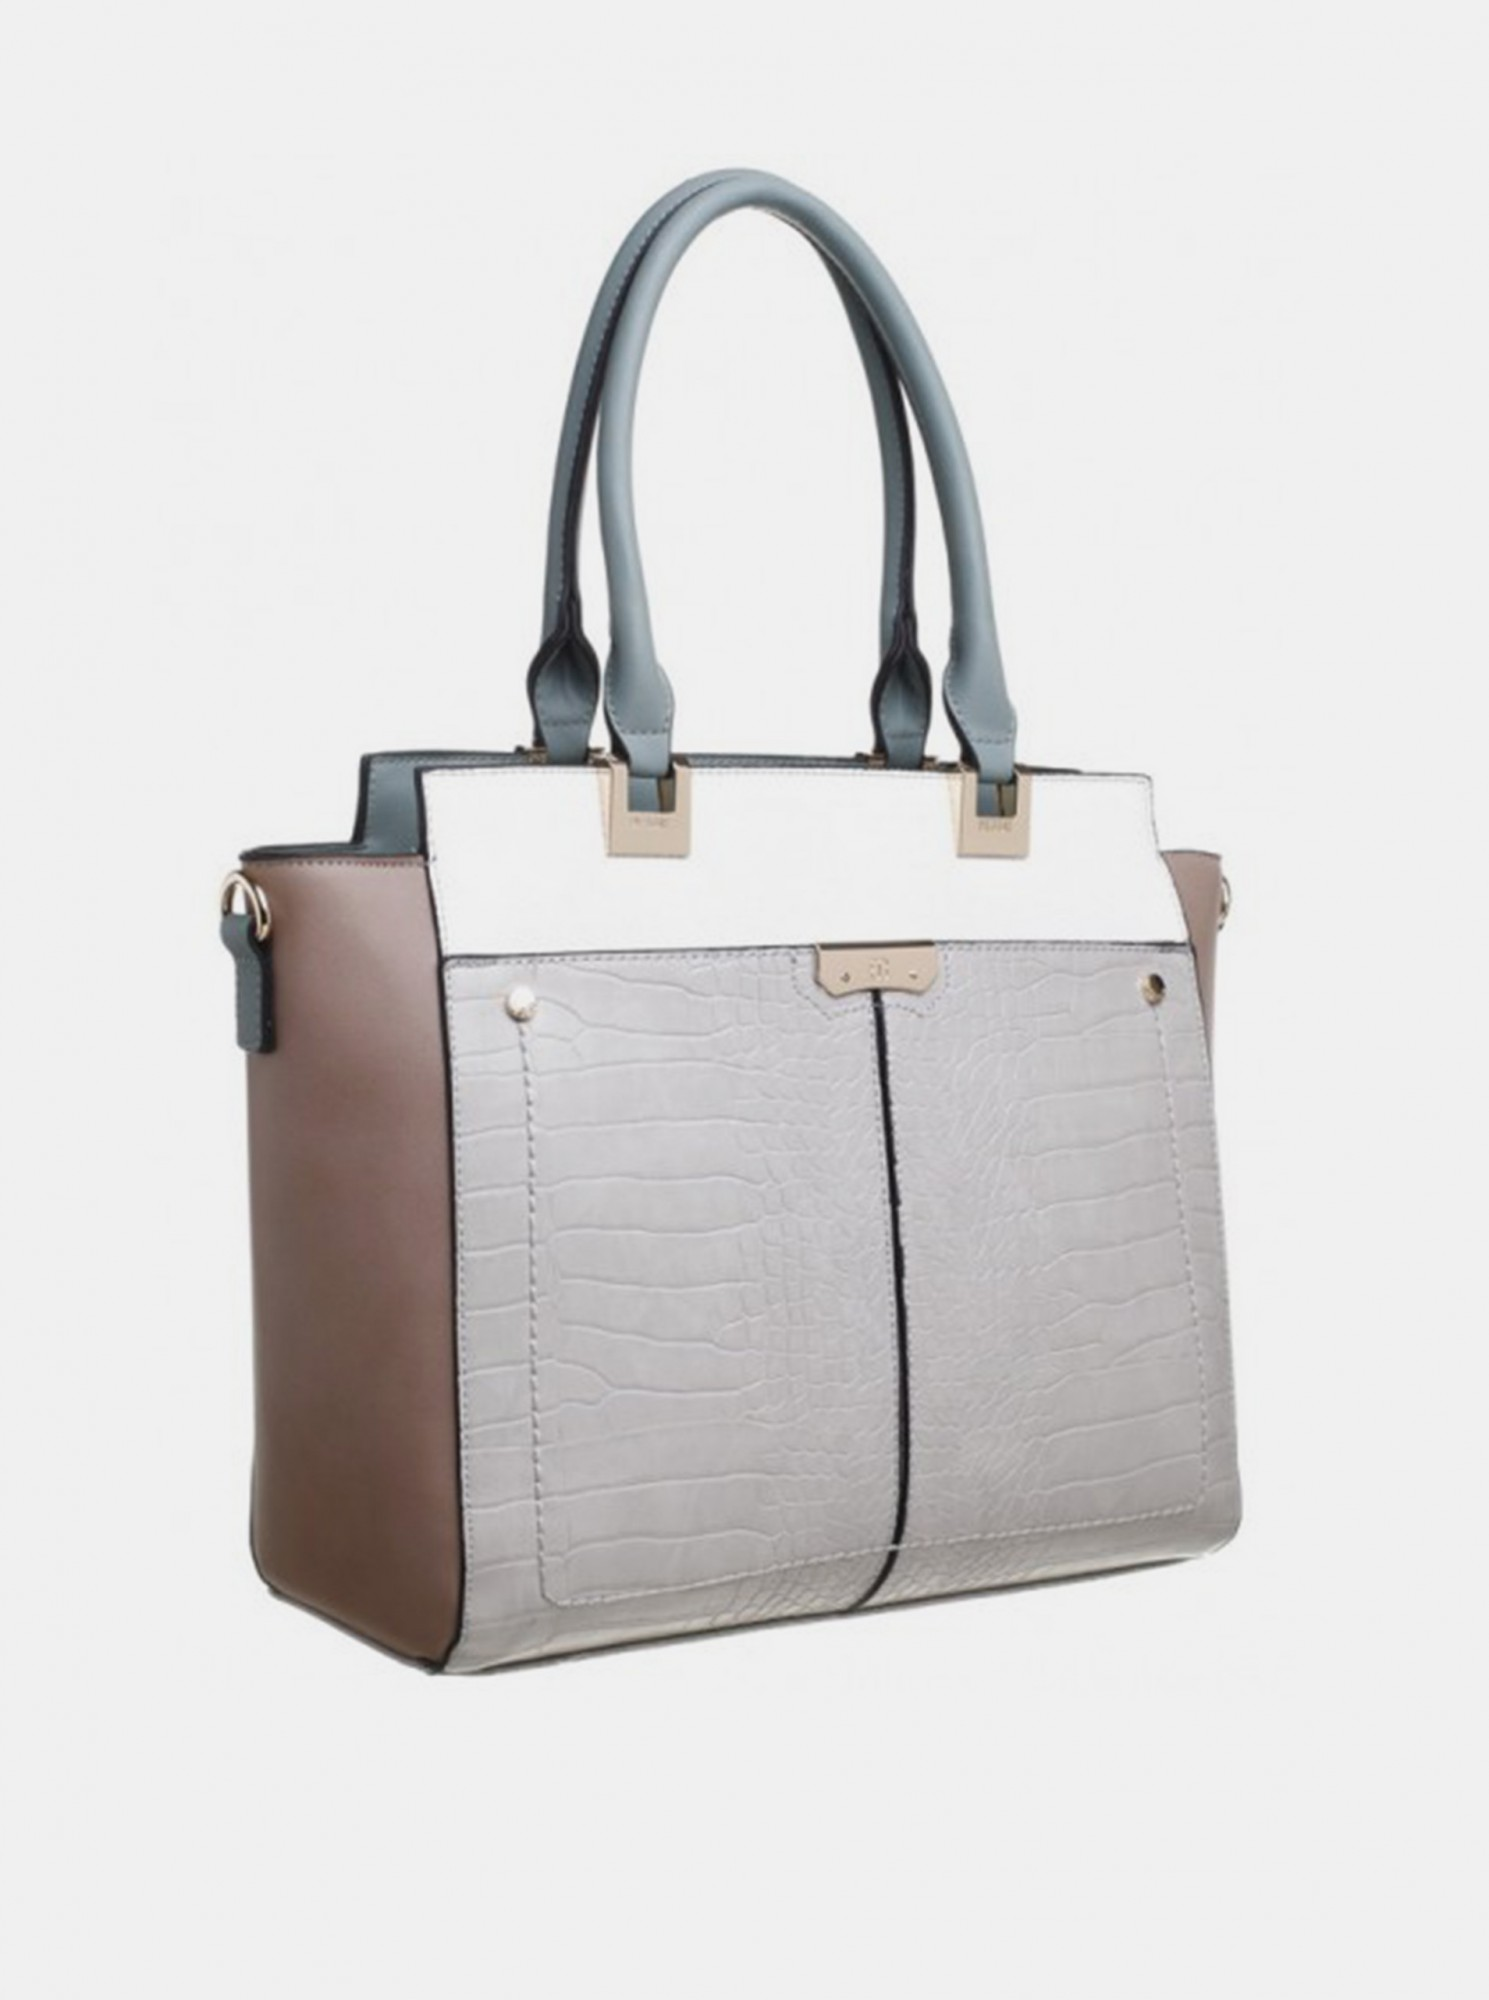 Bessie London grey handbag